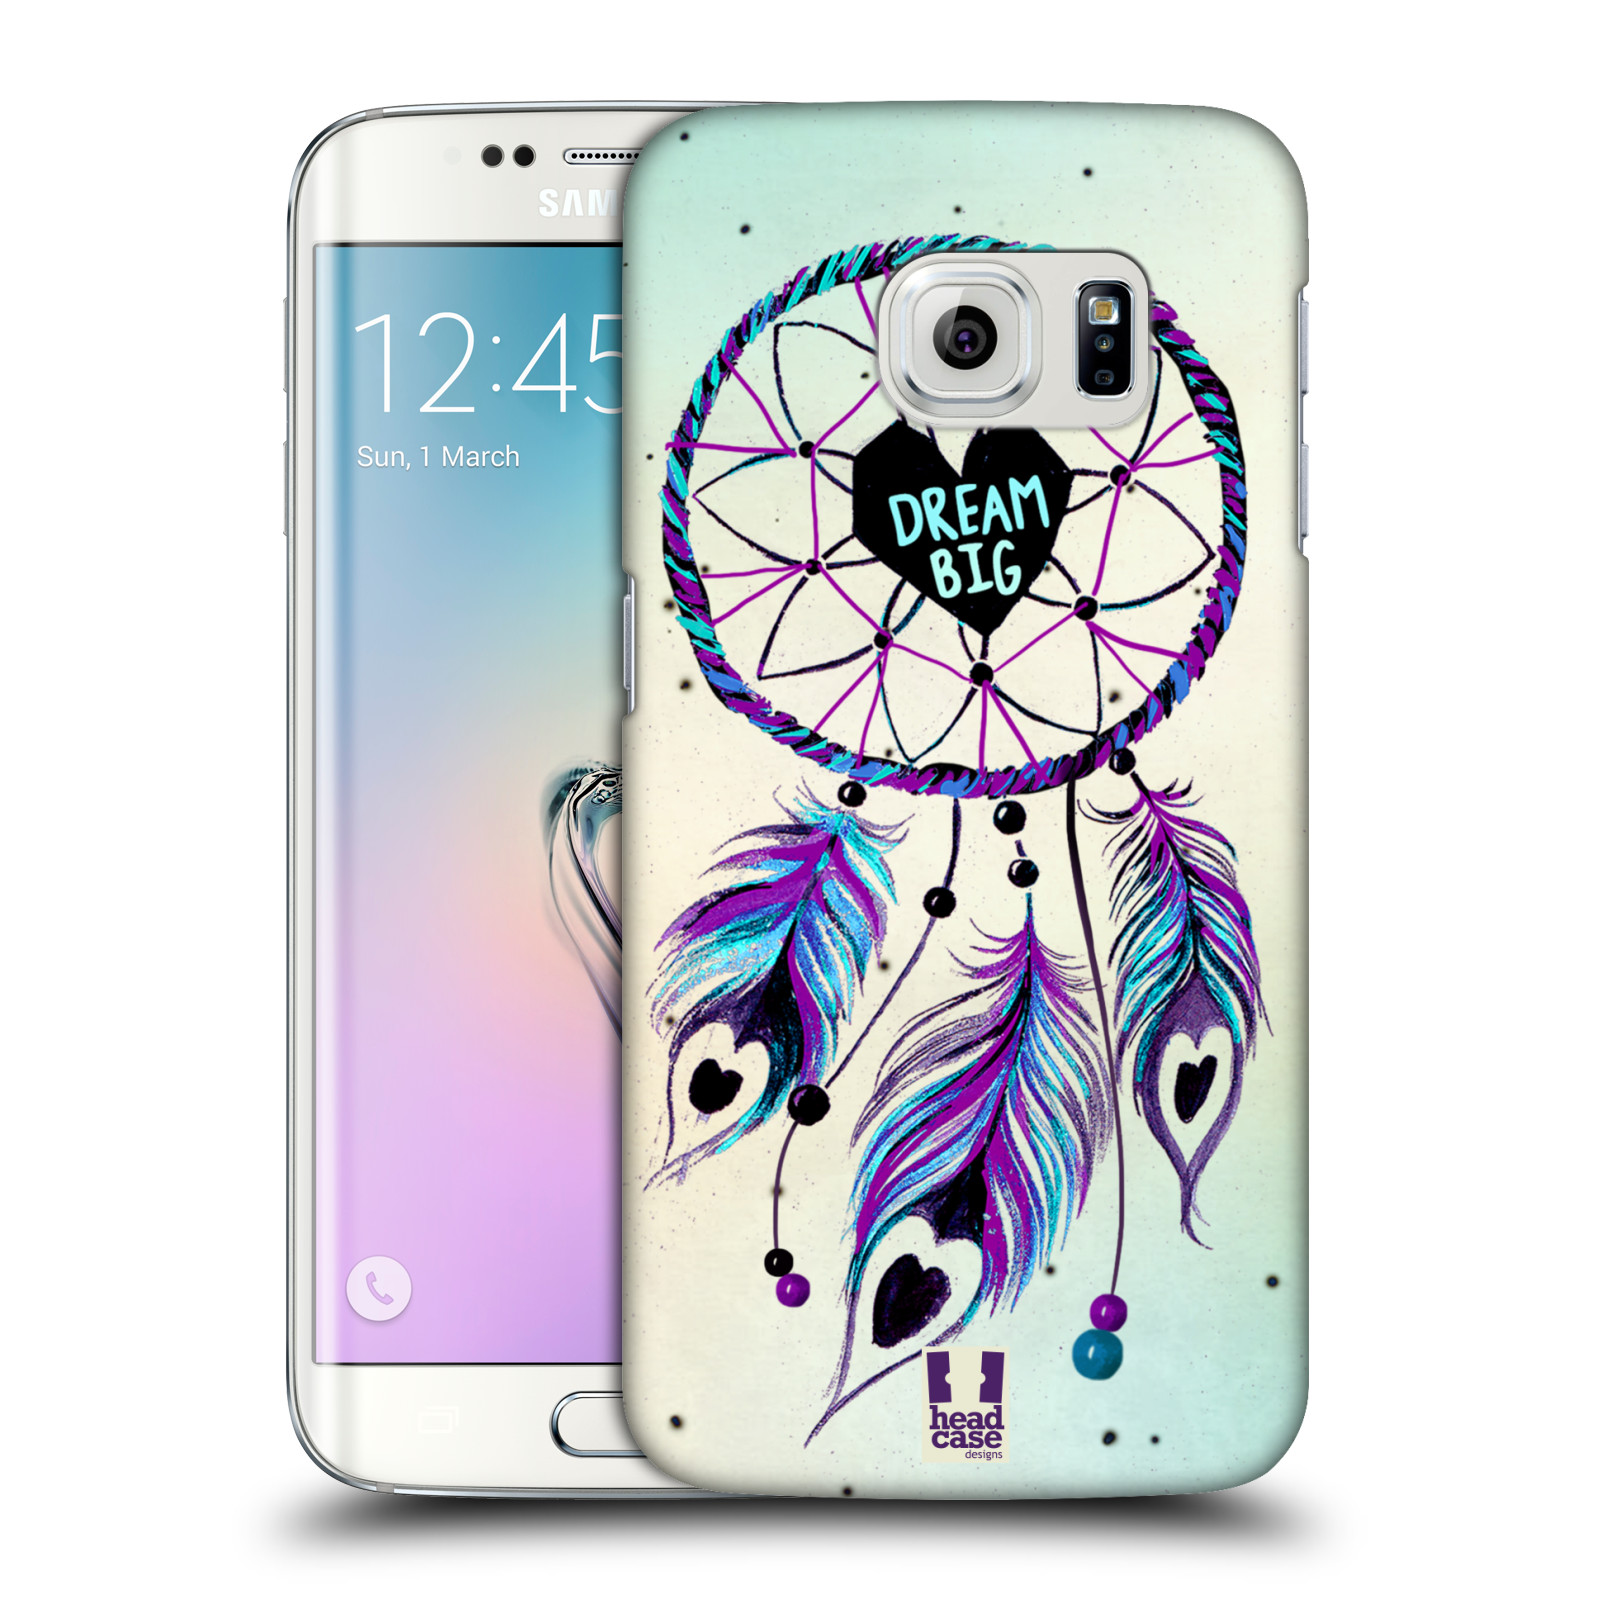 Plastové pouzdro na mobil Samsung Galaxy S6 Edge HEAD CASE Lapač Assorted Dream Big Srdce (Kryt či obal na mobilní telefon Samsung Galaxy S6 Edge SM-G925F)